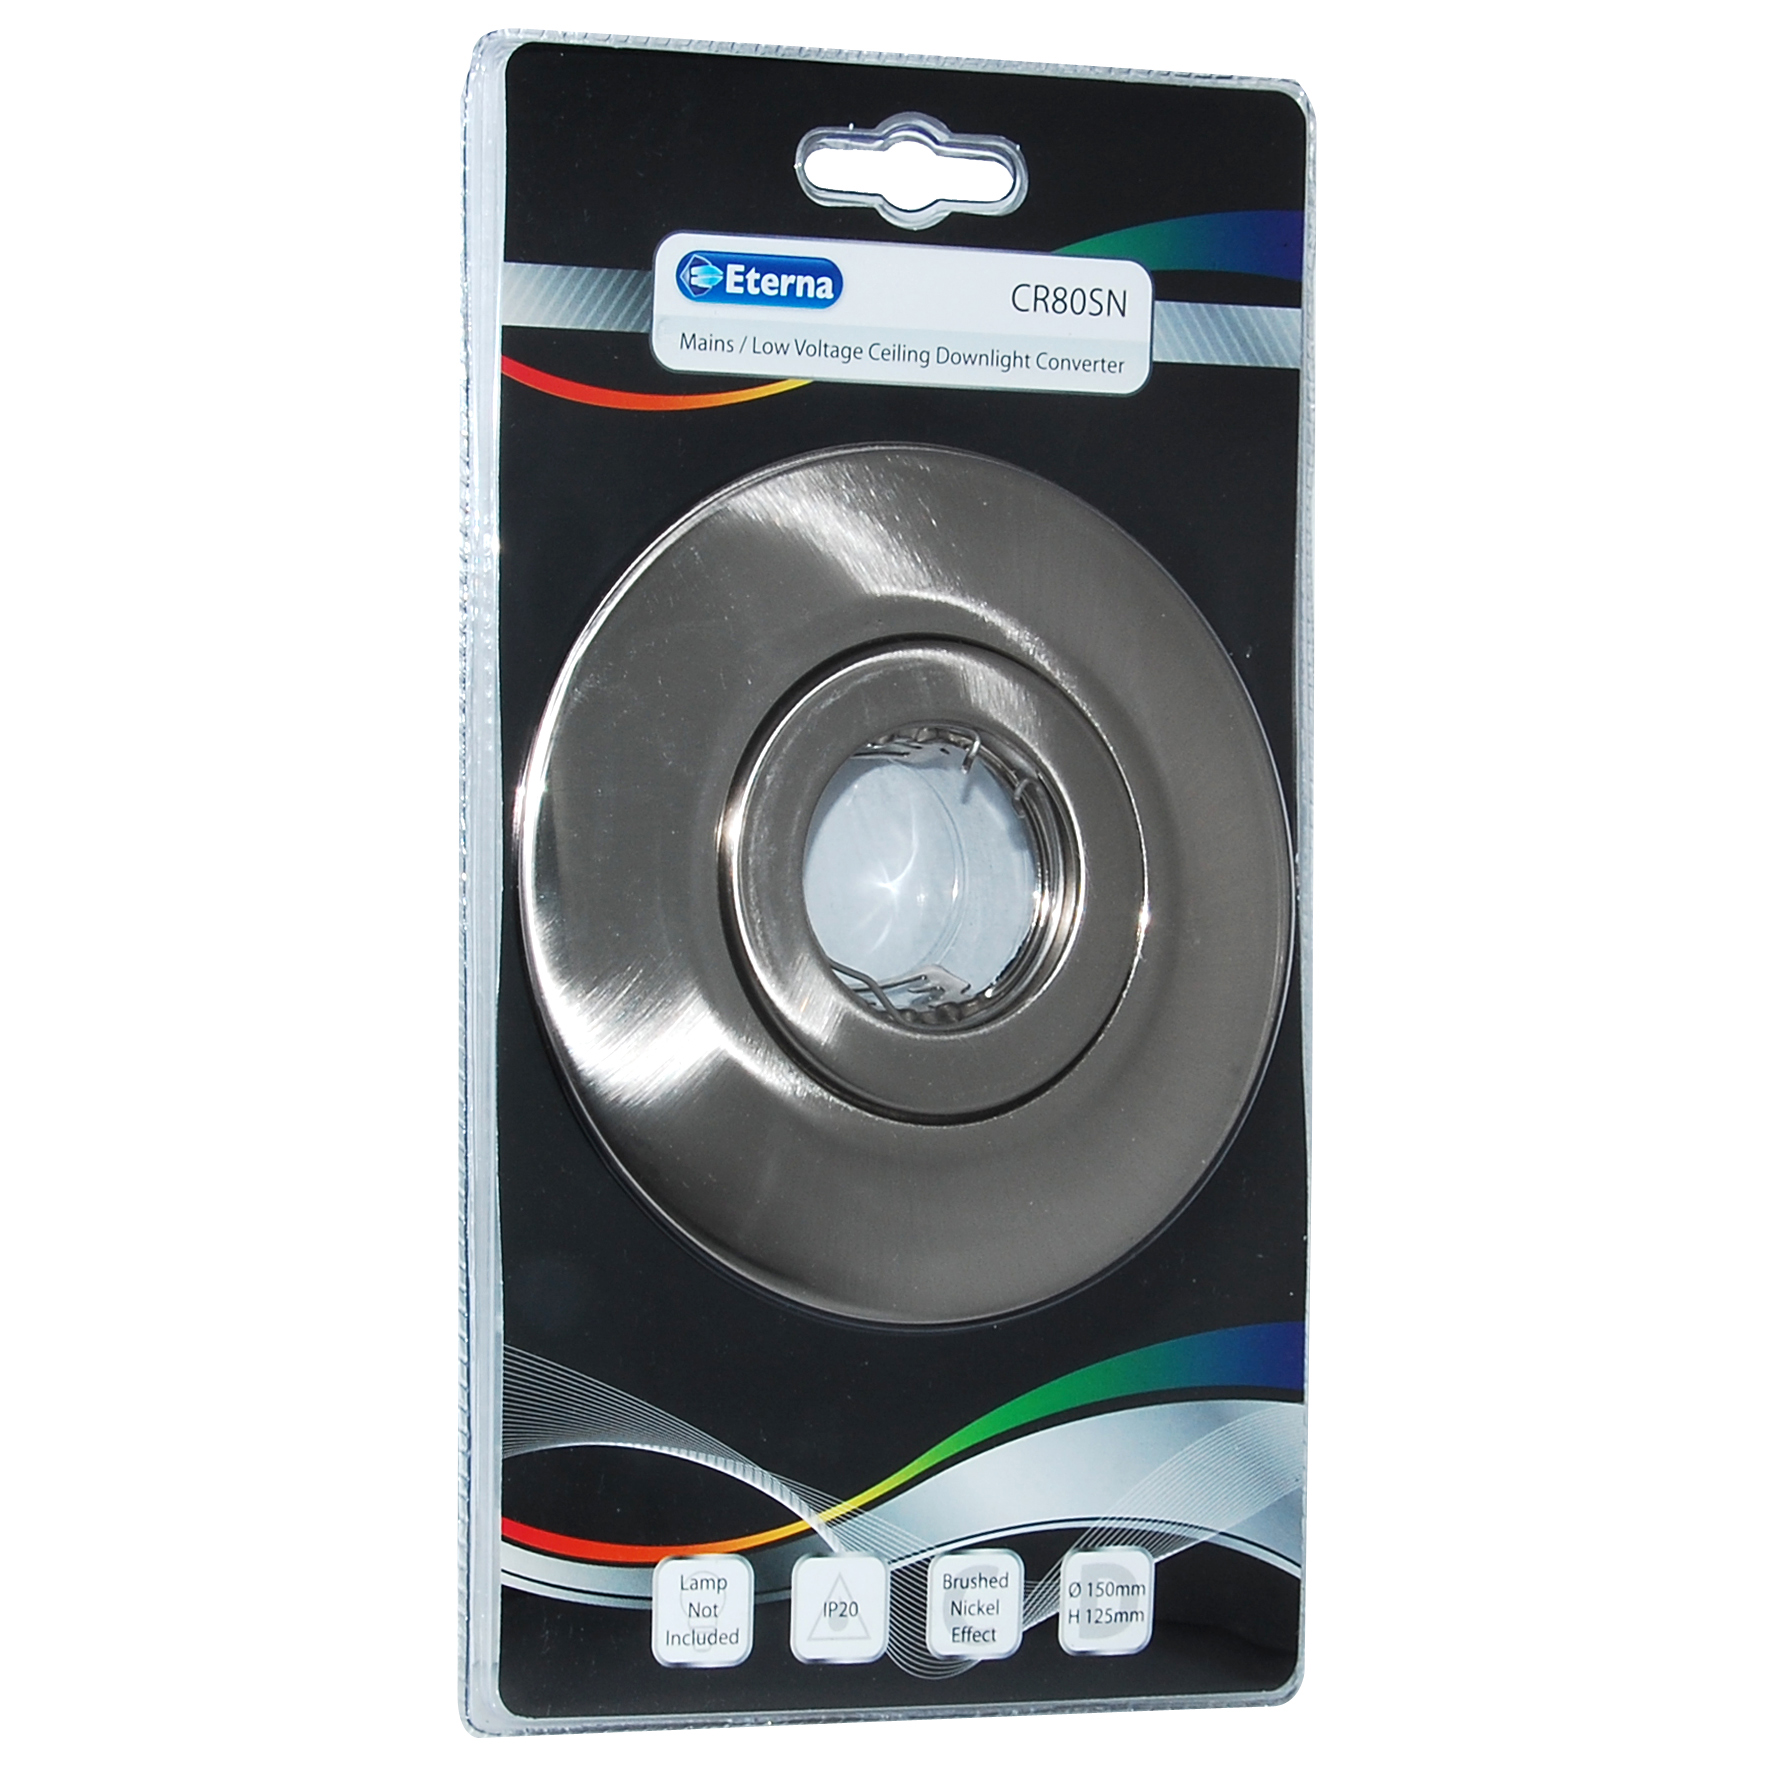 Low Voltage Indoor Lighting Systems: Eterna GU10 / Low Voltage Ceiling Converter Brushed Nickle